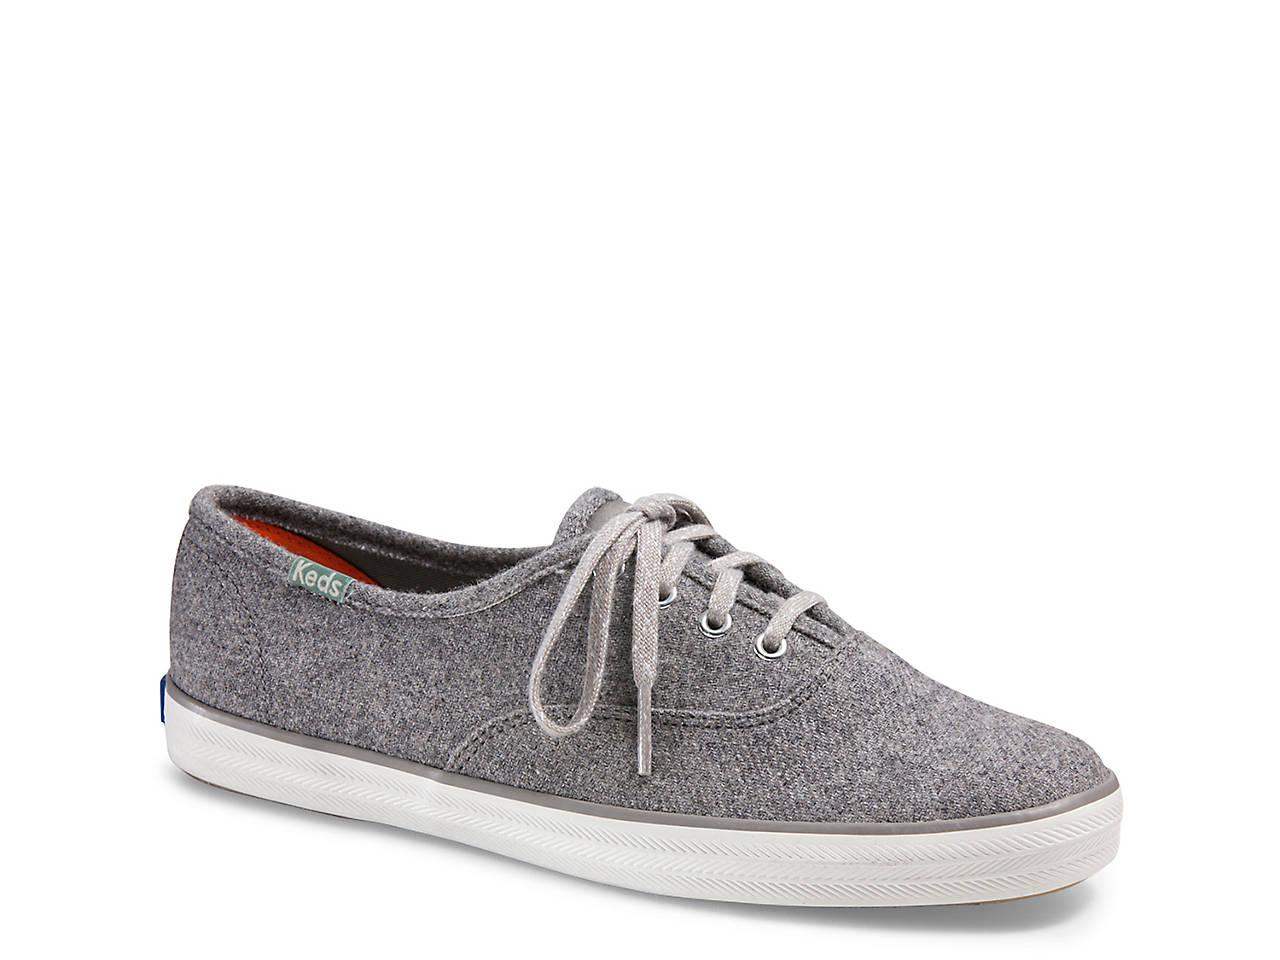 5a178de60c060 Keds Champion Wool Sneaker - Women s Women s Shoes